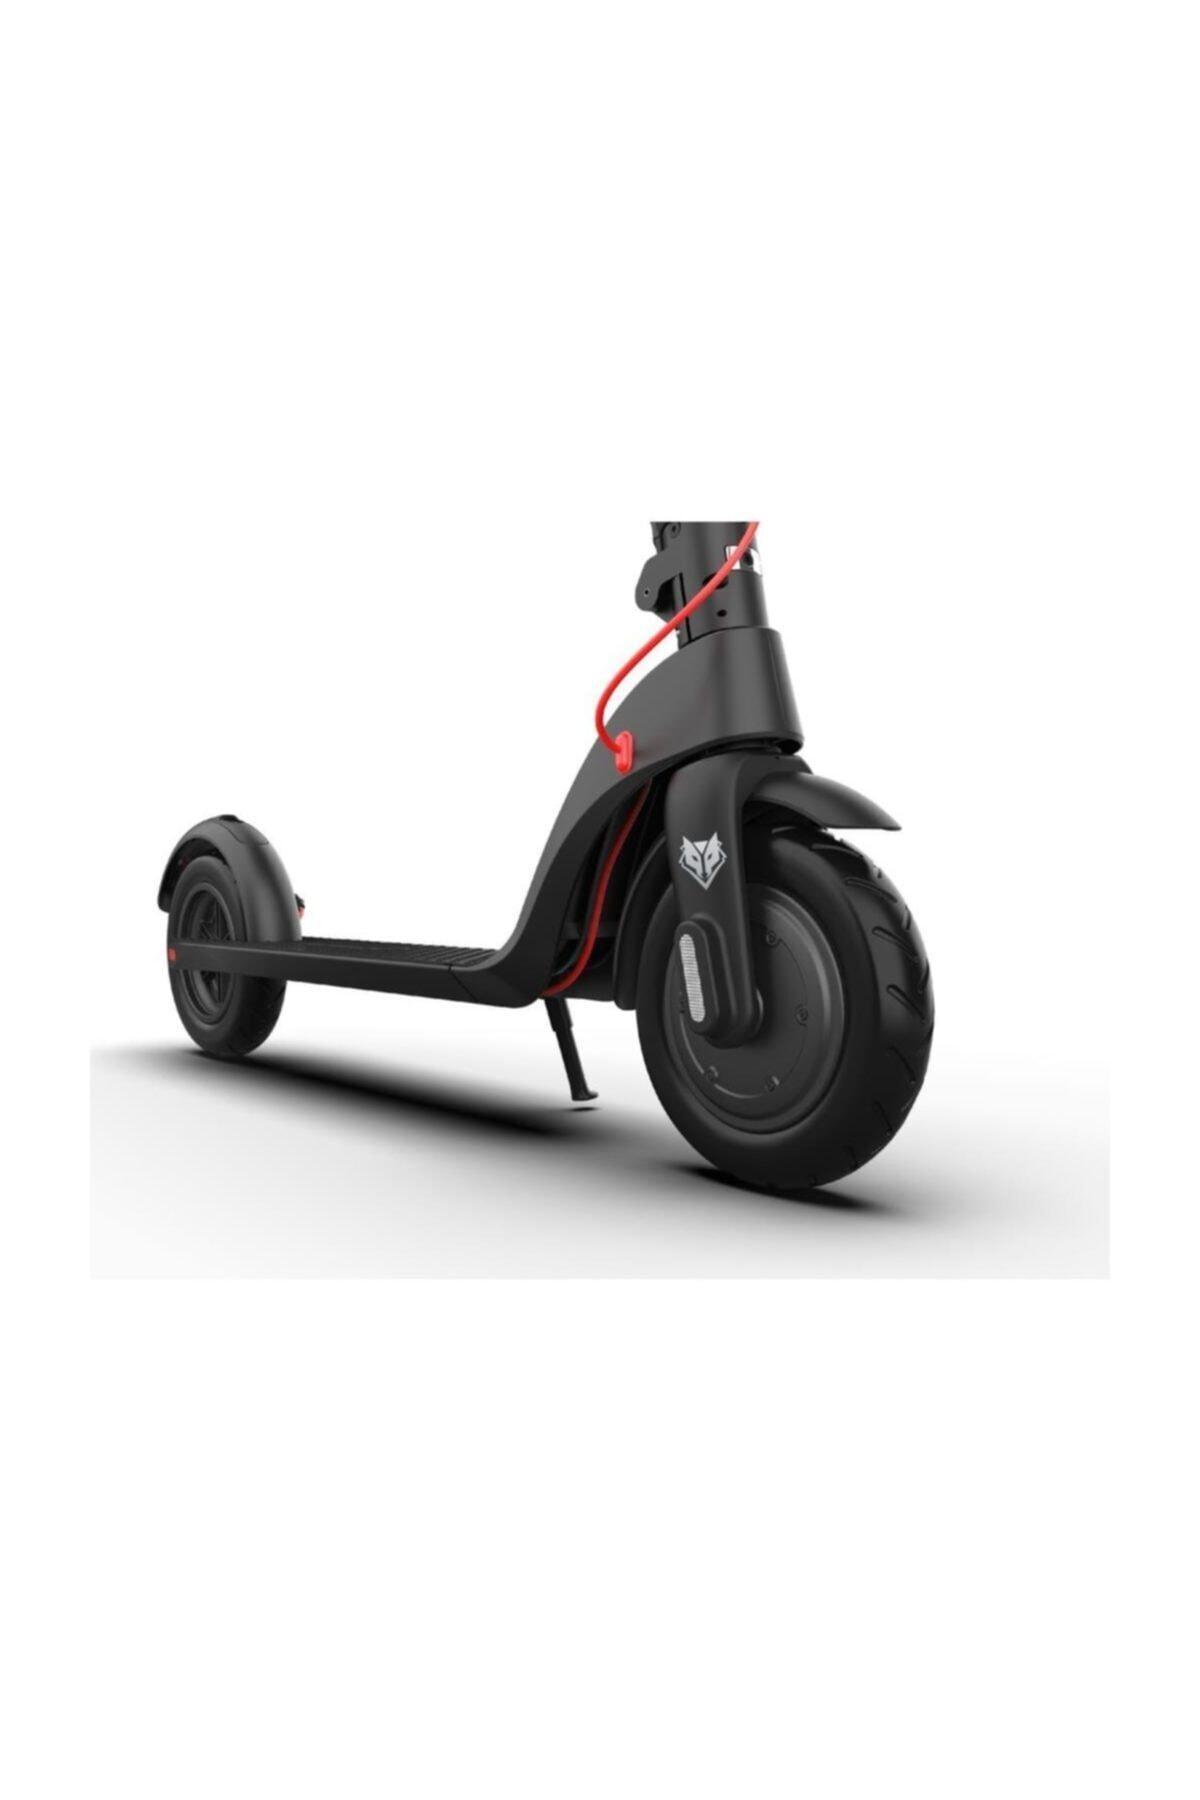 FOXSMART X7 350WATT Siyah Katlanabilir Elektirikli Scooter